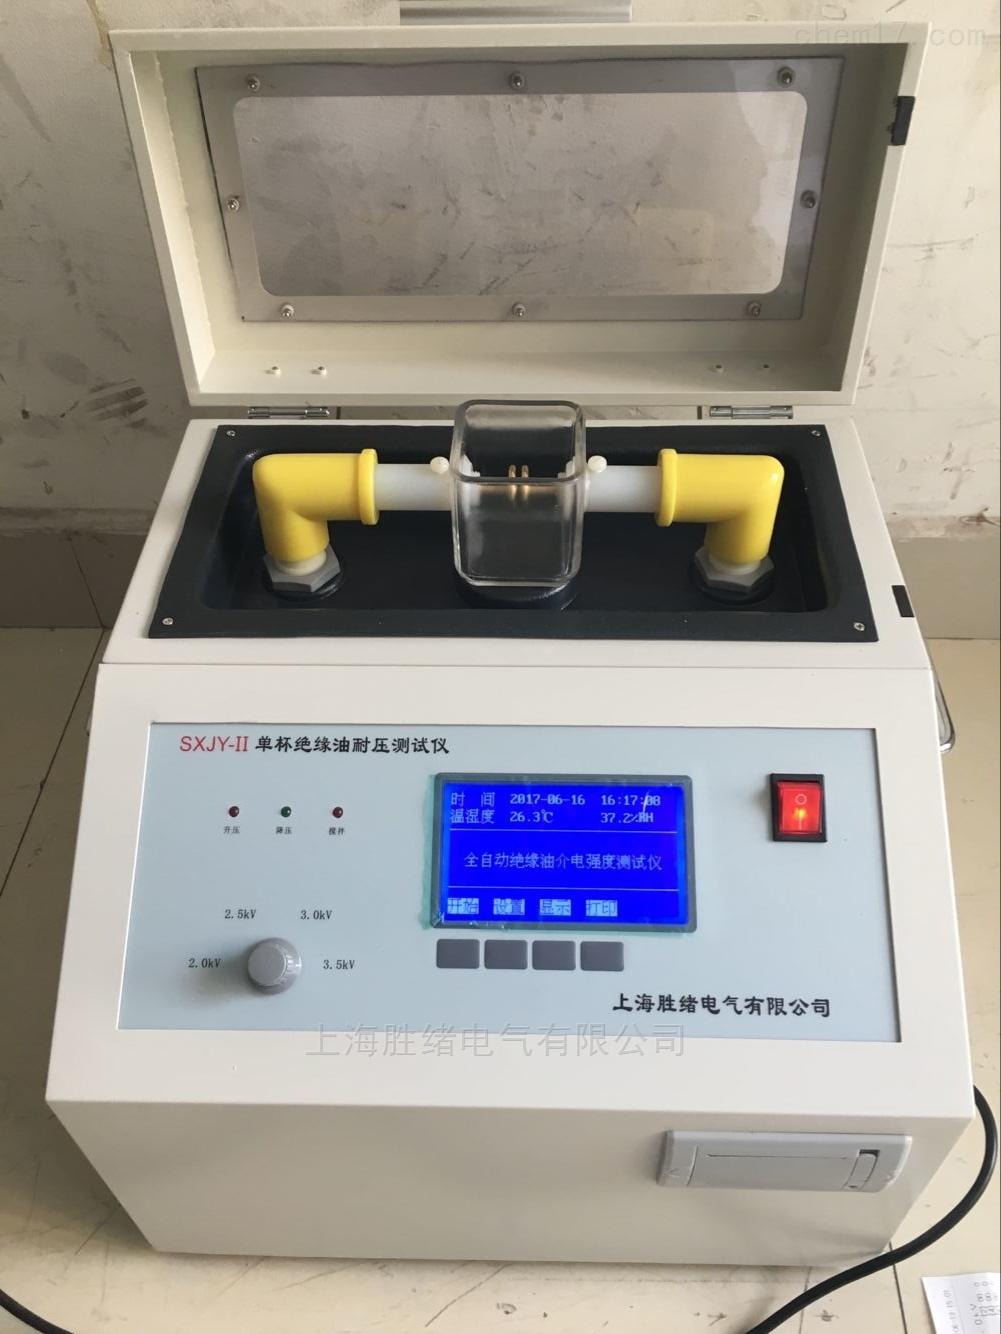 YCYJS 绝缘油介质损耗及电阻率测试仪